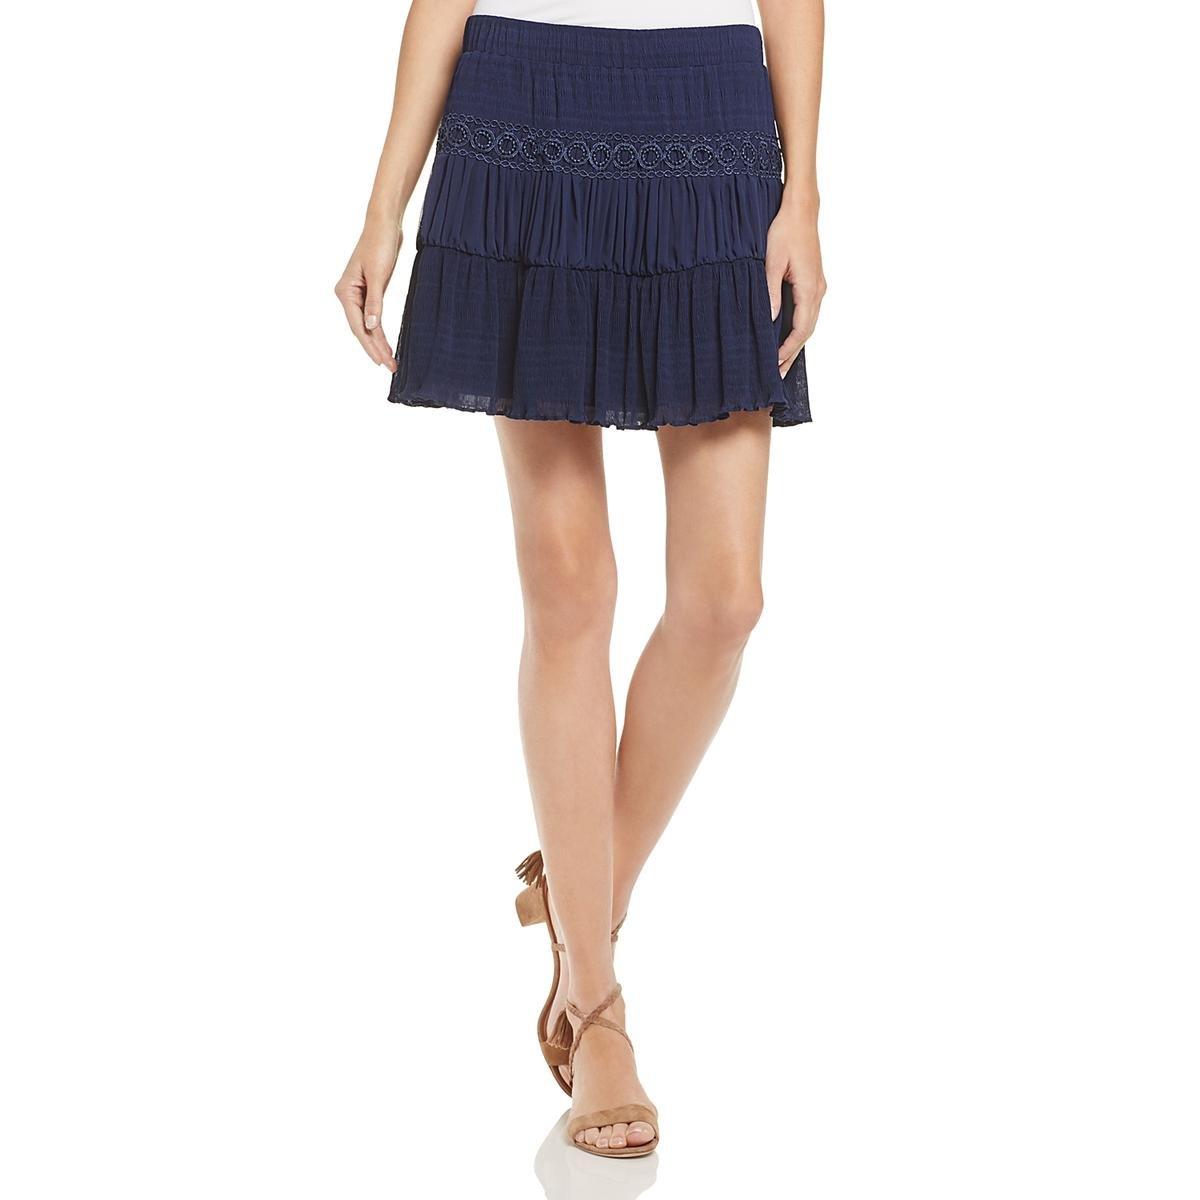 GUESS Women's Sofia Peasant Skirt, Peacoat, L